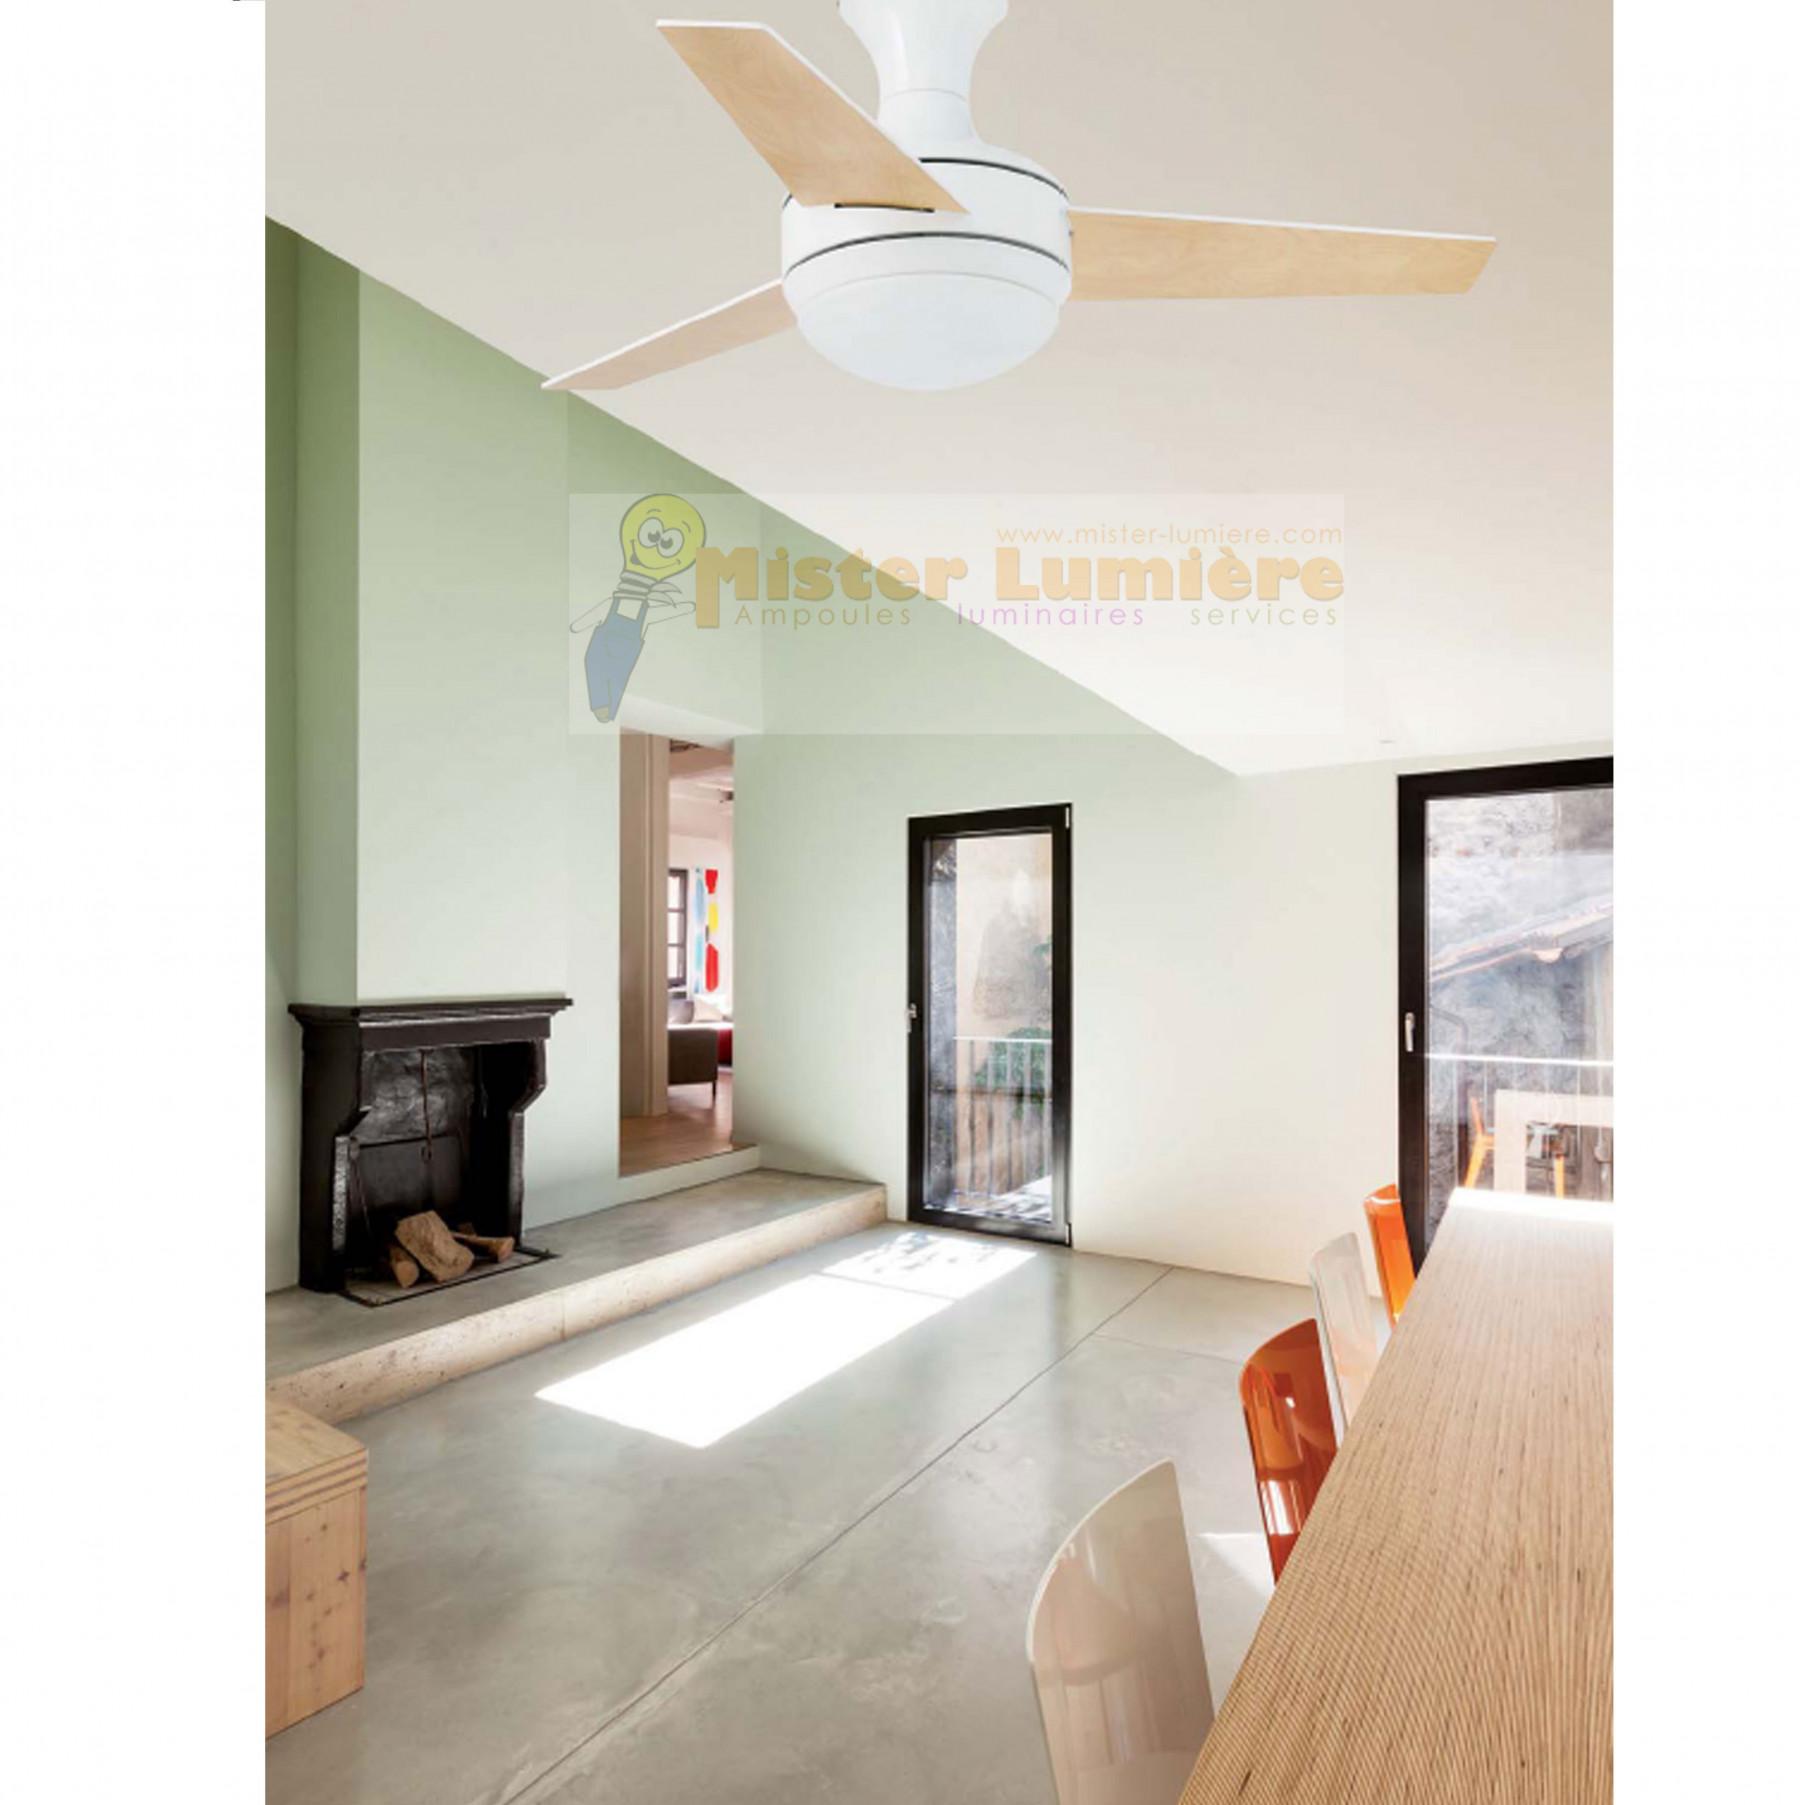 Ventilateur de plafond lumineux MINI-UFO blanc